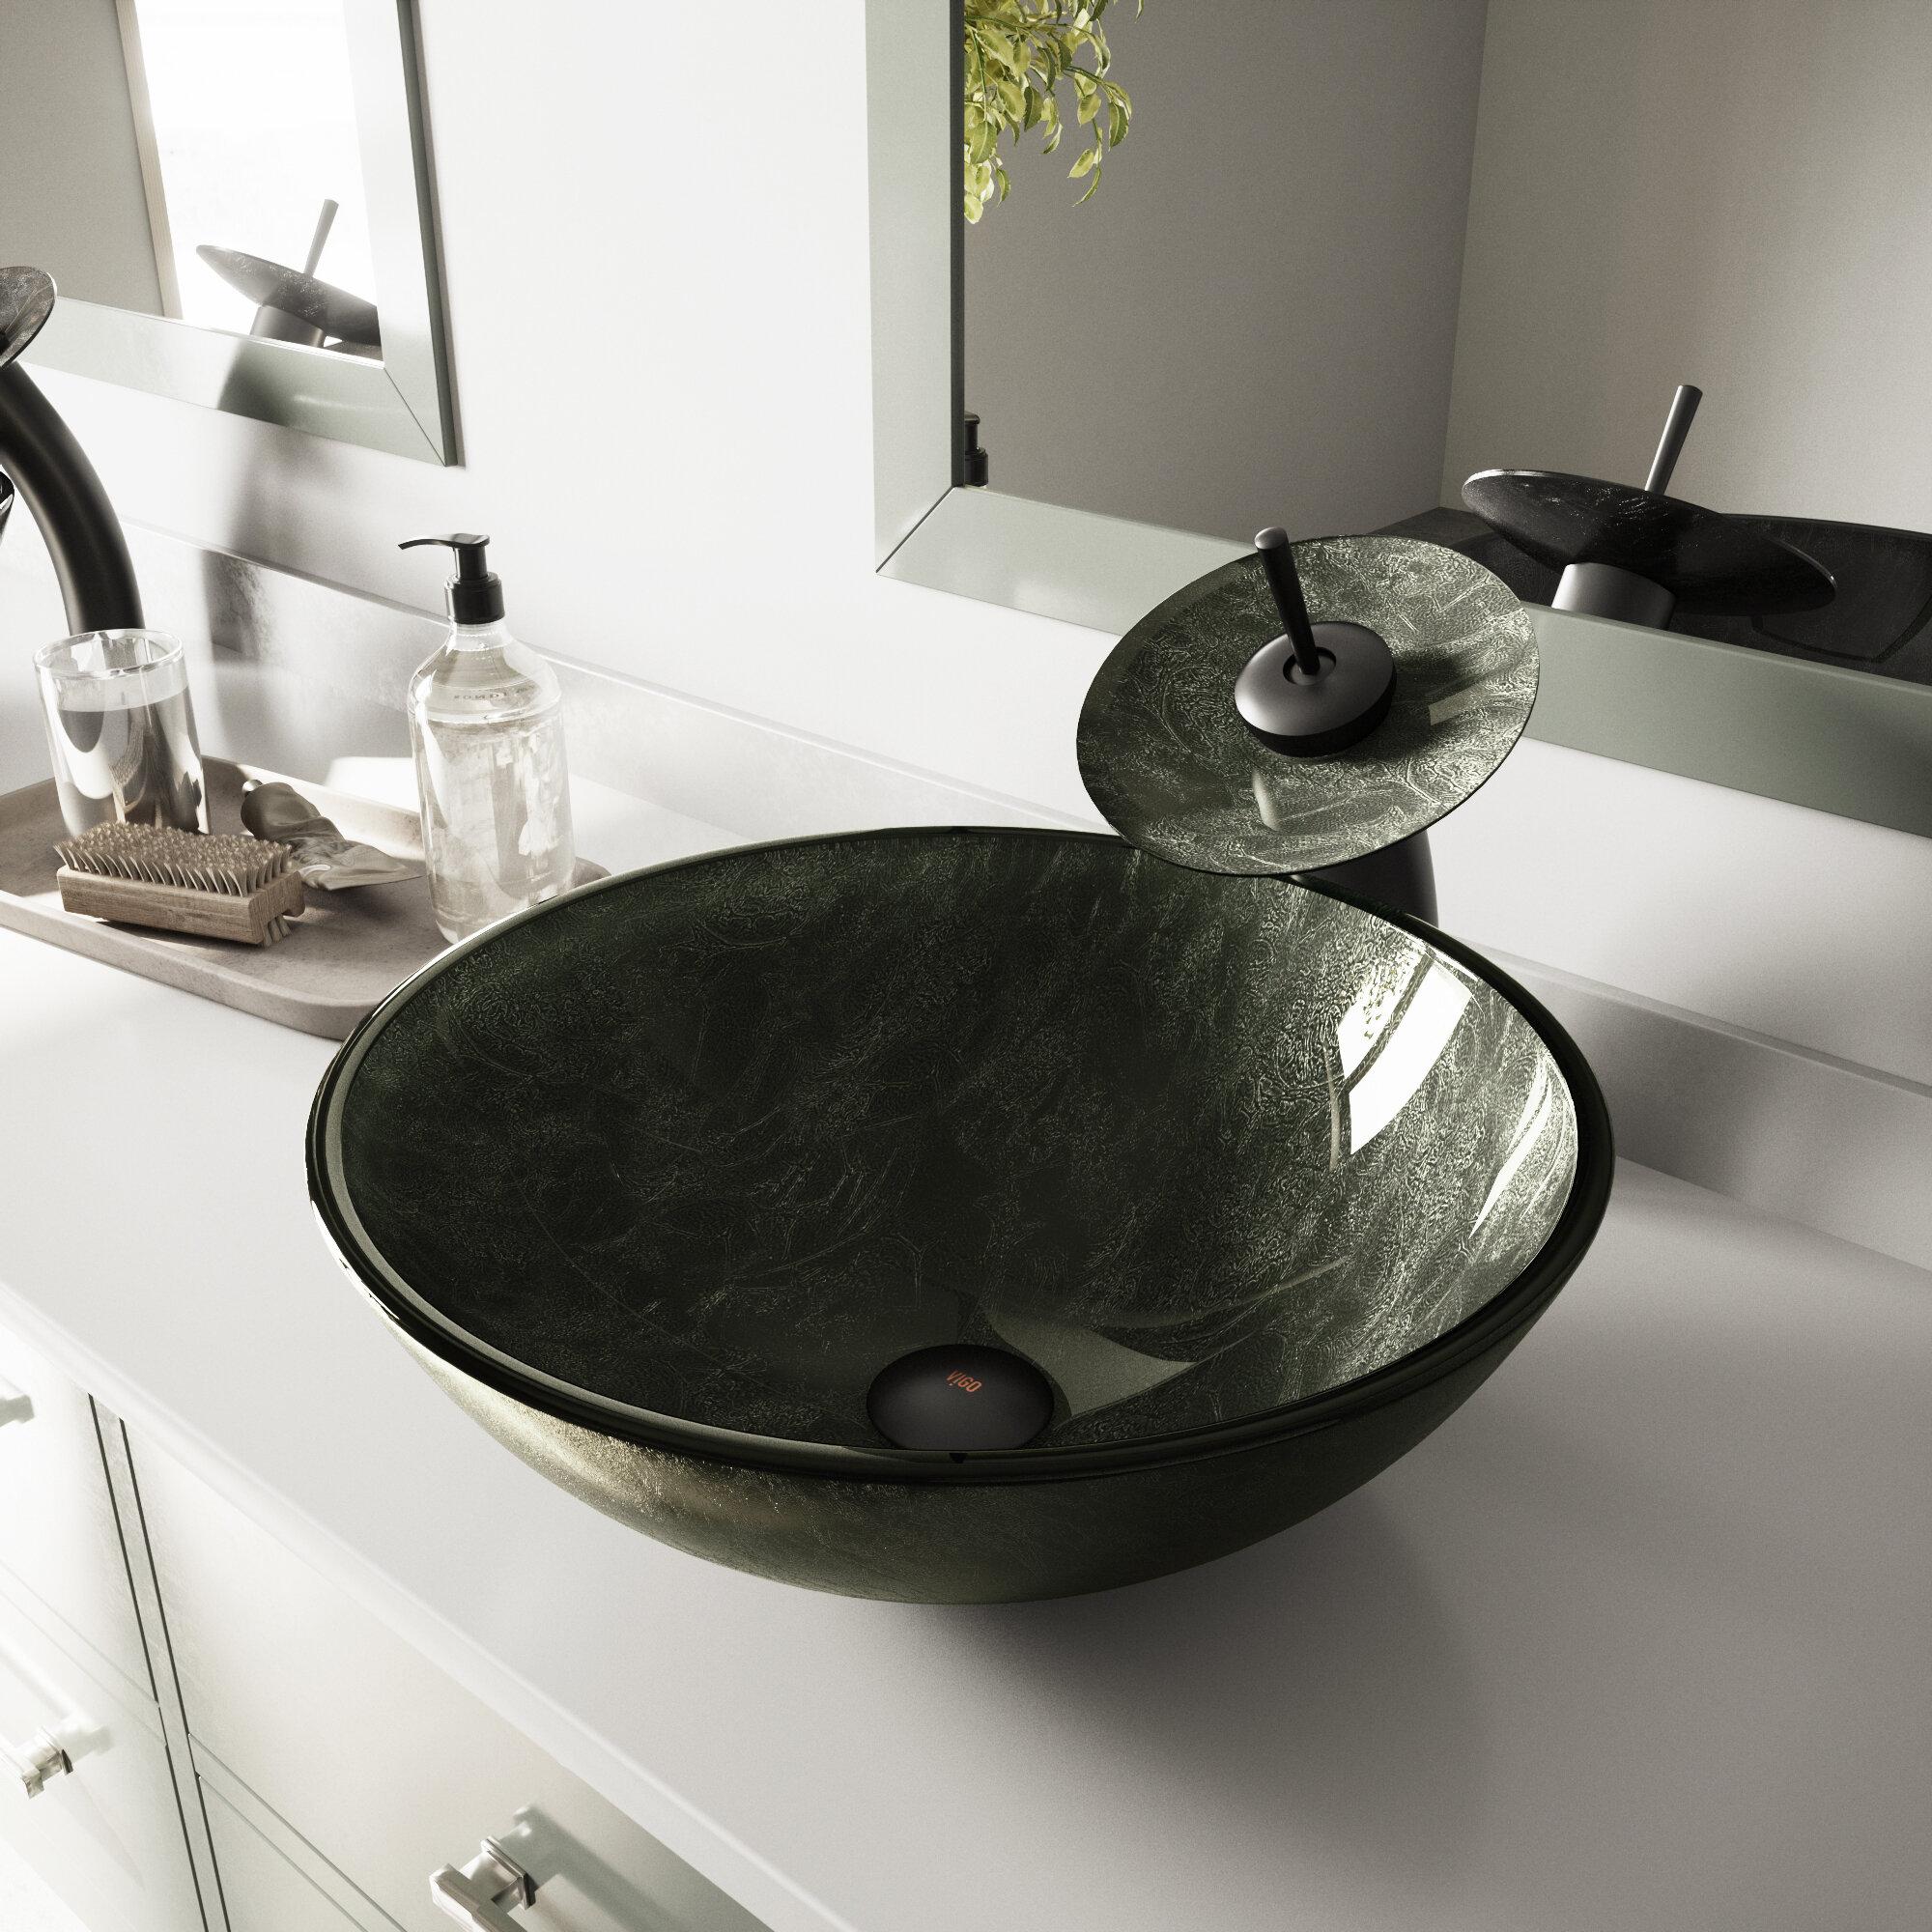 Vigo Gray Glass Handmade Circular Vessel Bathroom Sink Reviews Wayfair